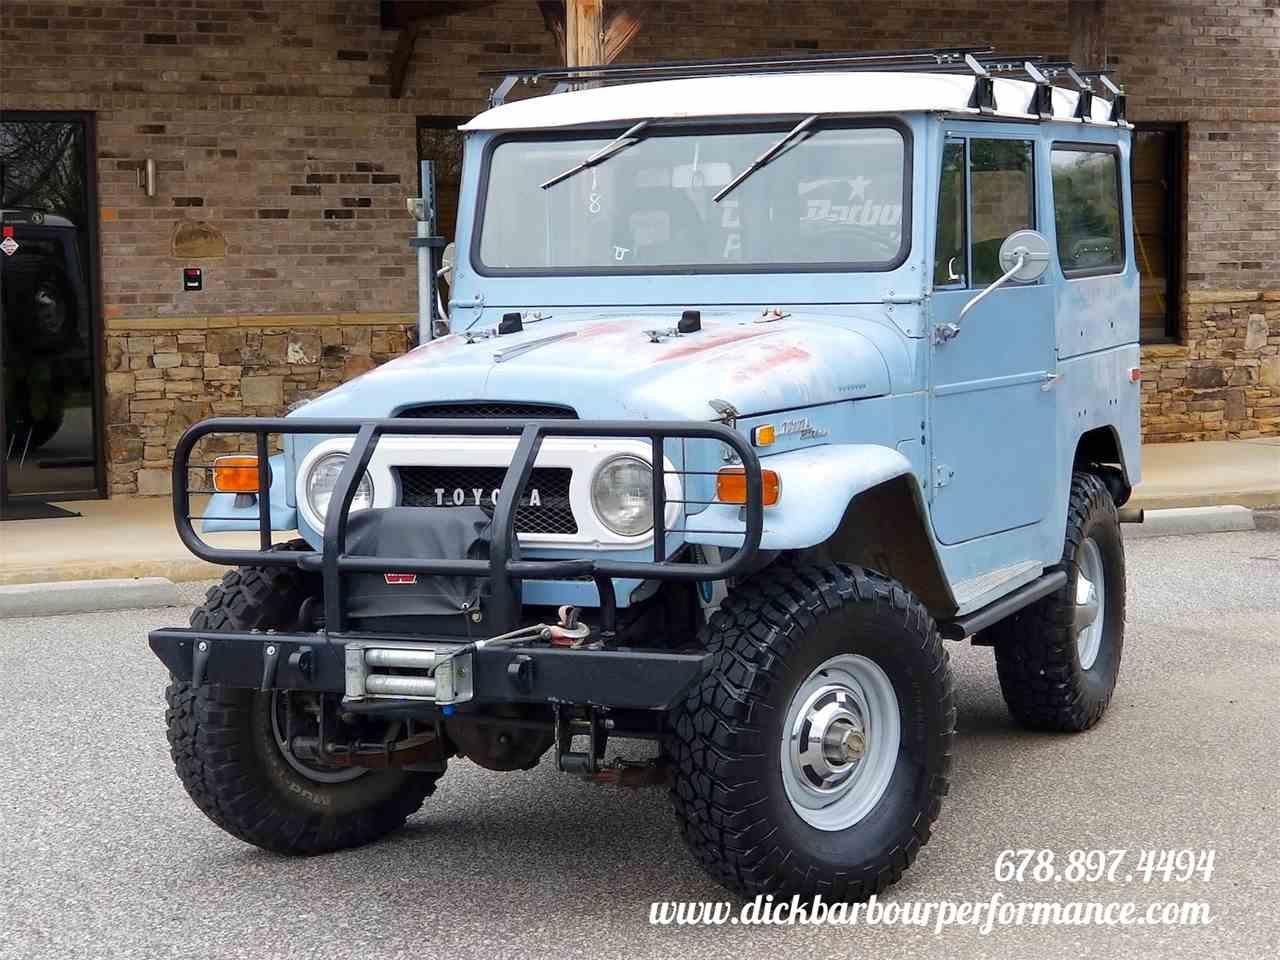 1971 Toyota Land Cruiser Fj40 For Sale Classiccars Com